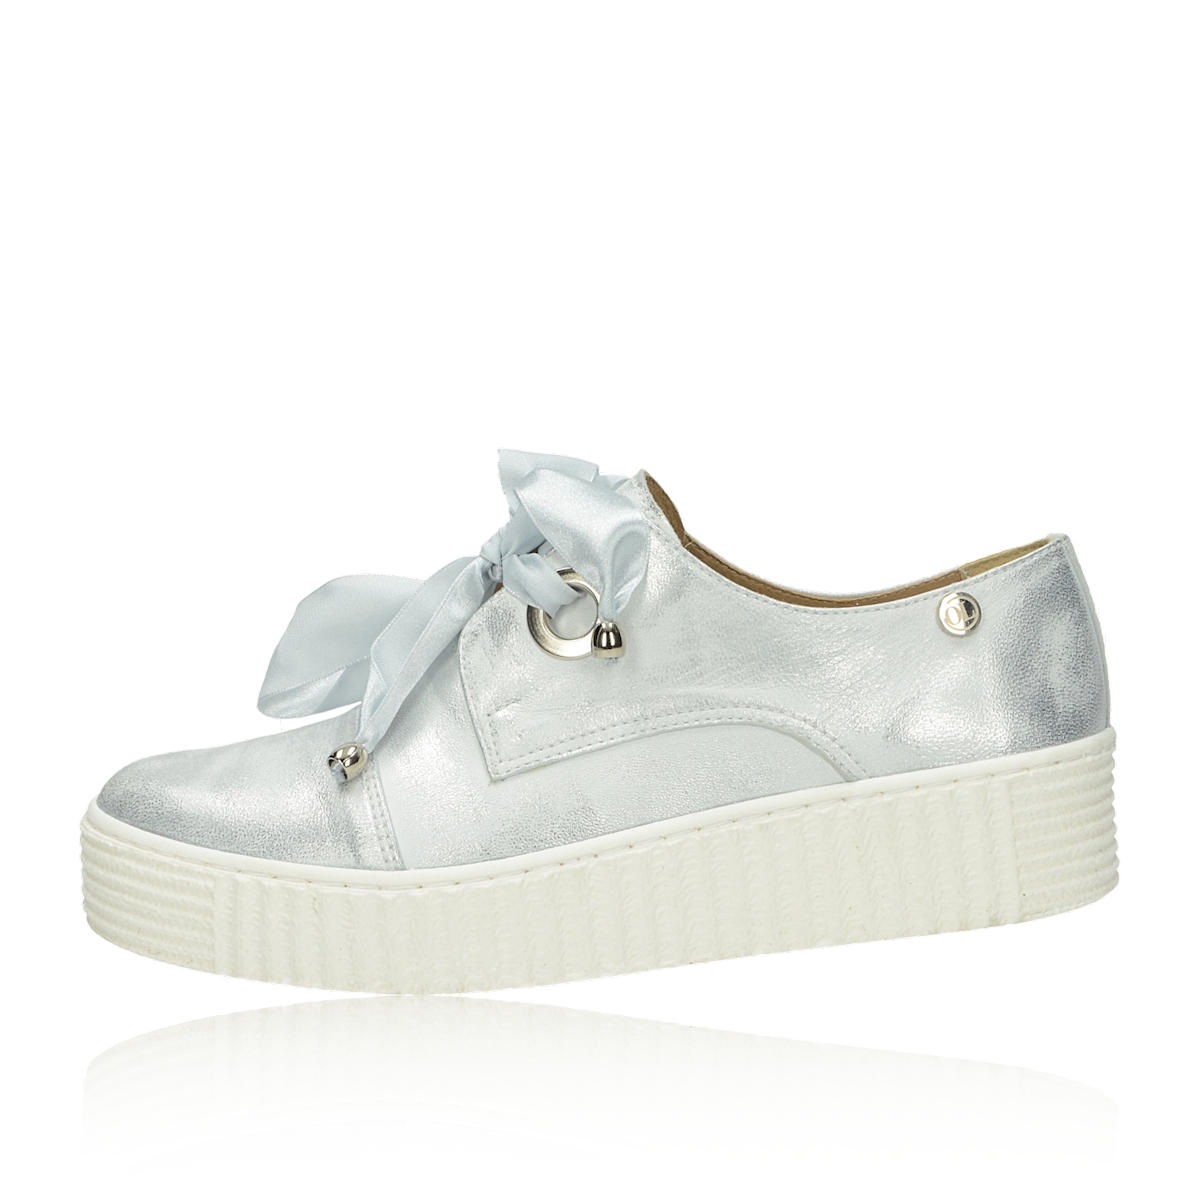 00c00880d863 ... Olivia shoes dámske kožené tenisky- strieborné ...